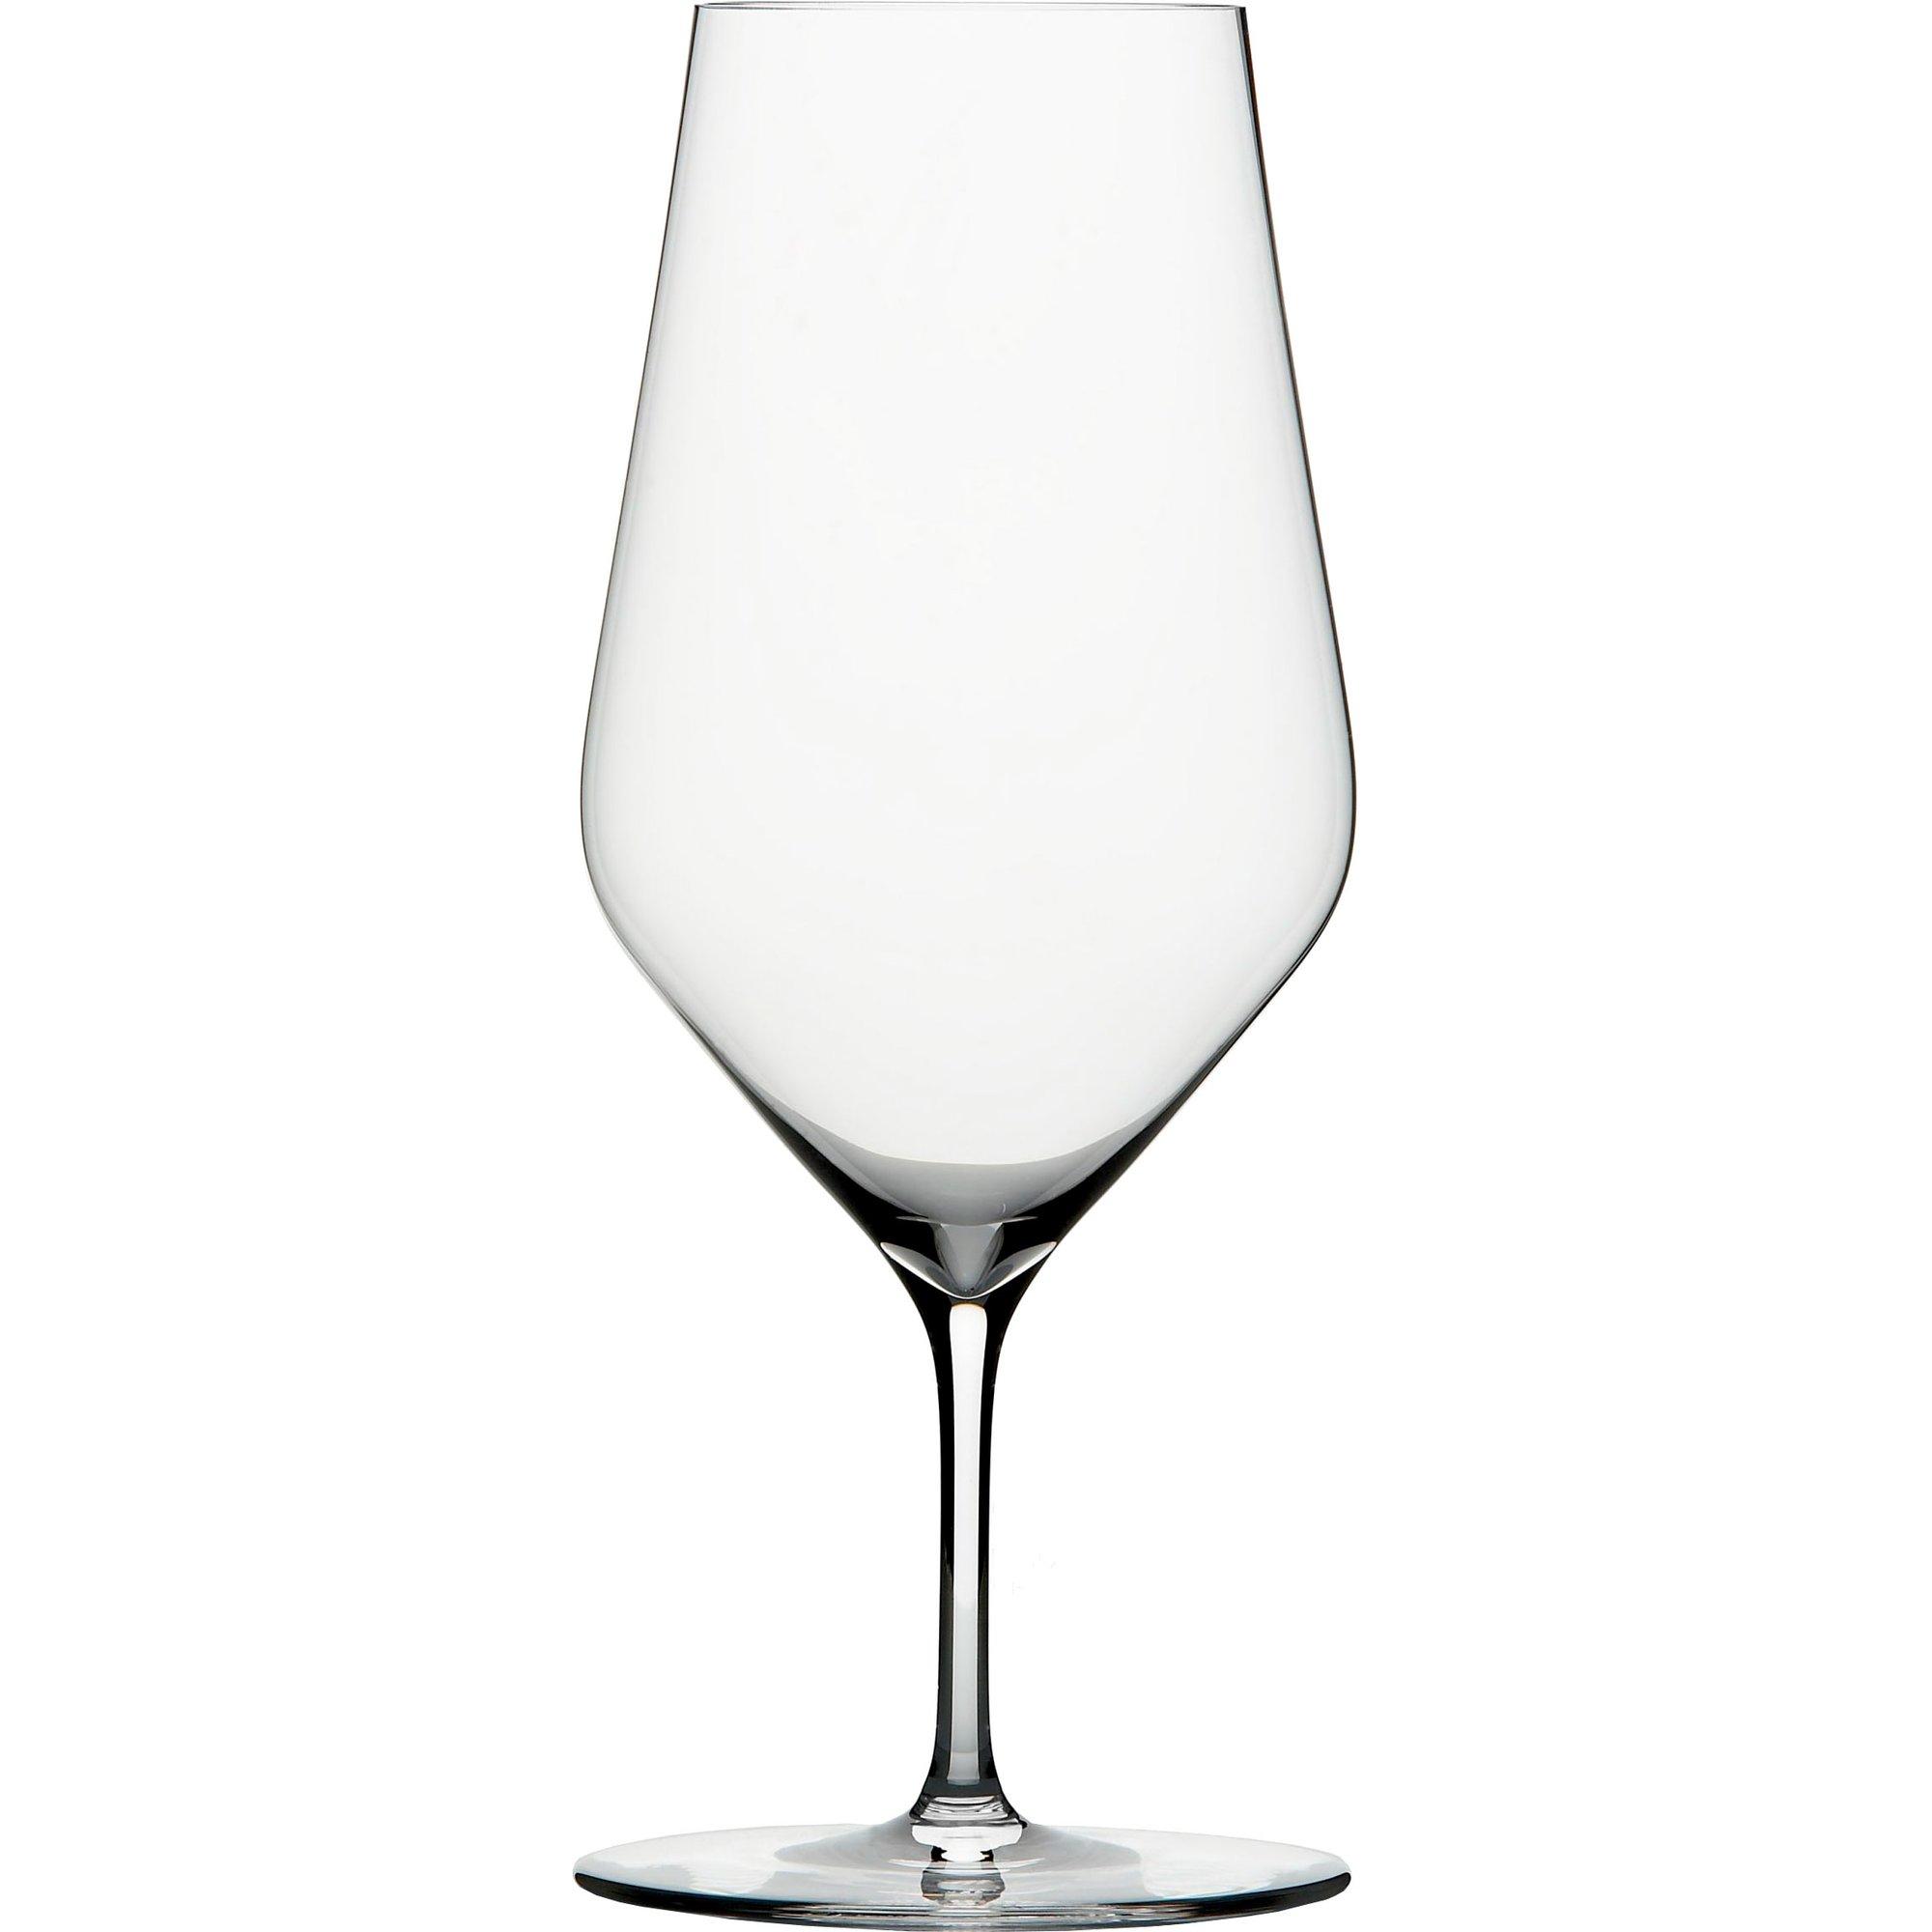 Zalto Vattenglas 400 ml. 1 st.